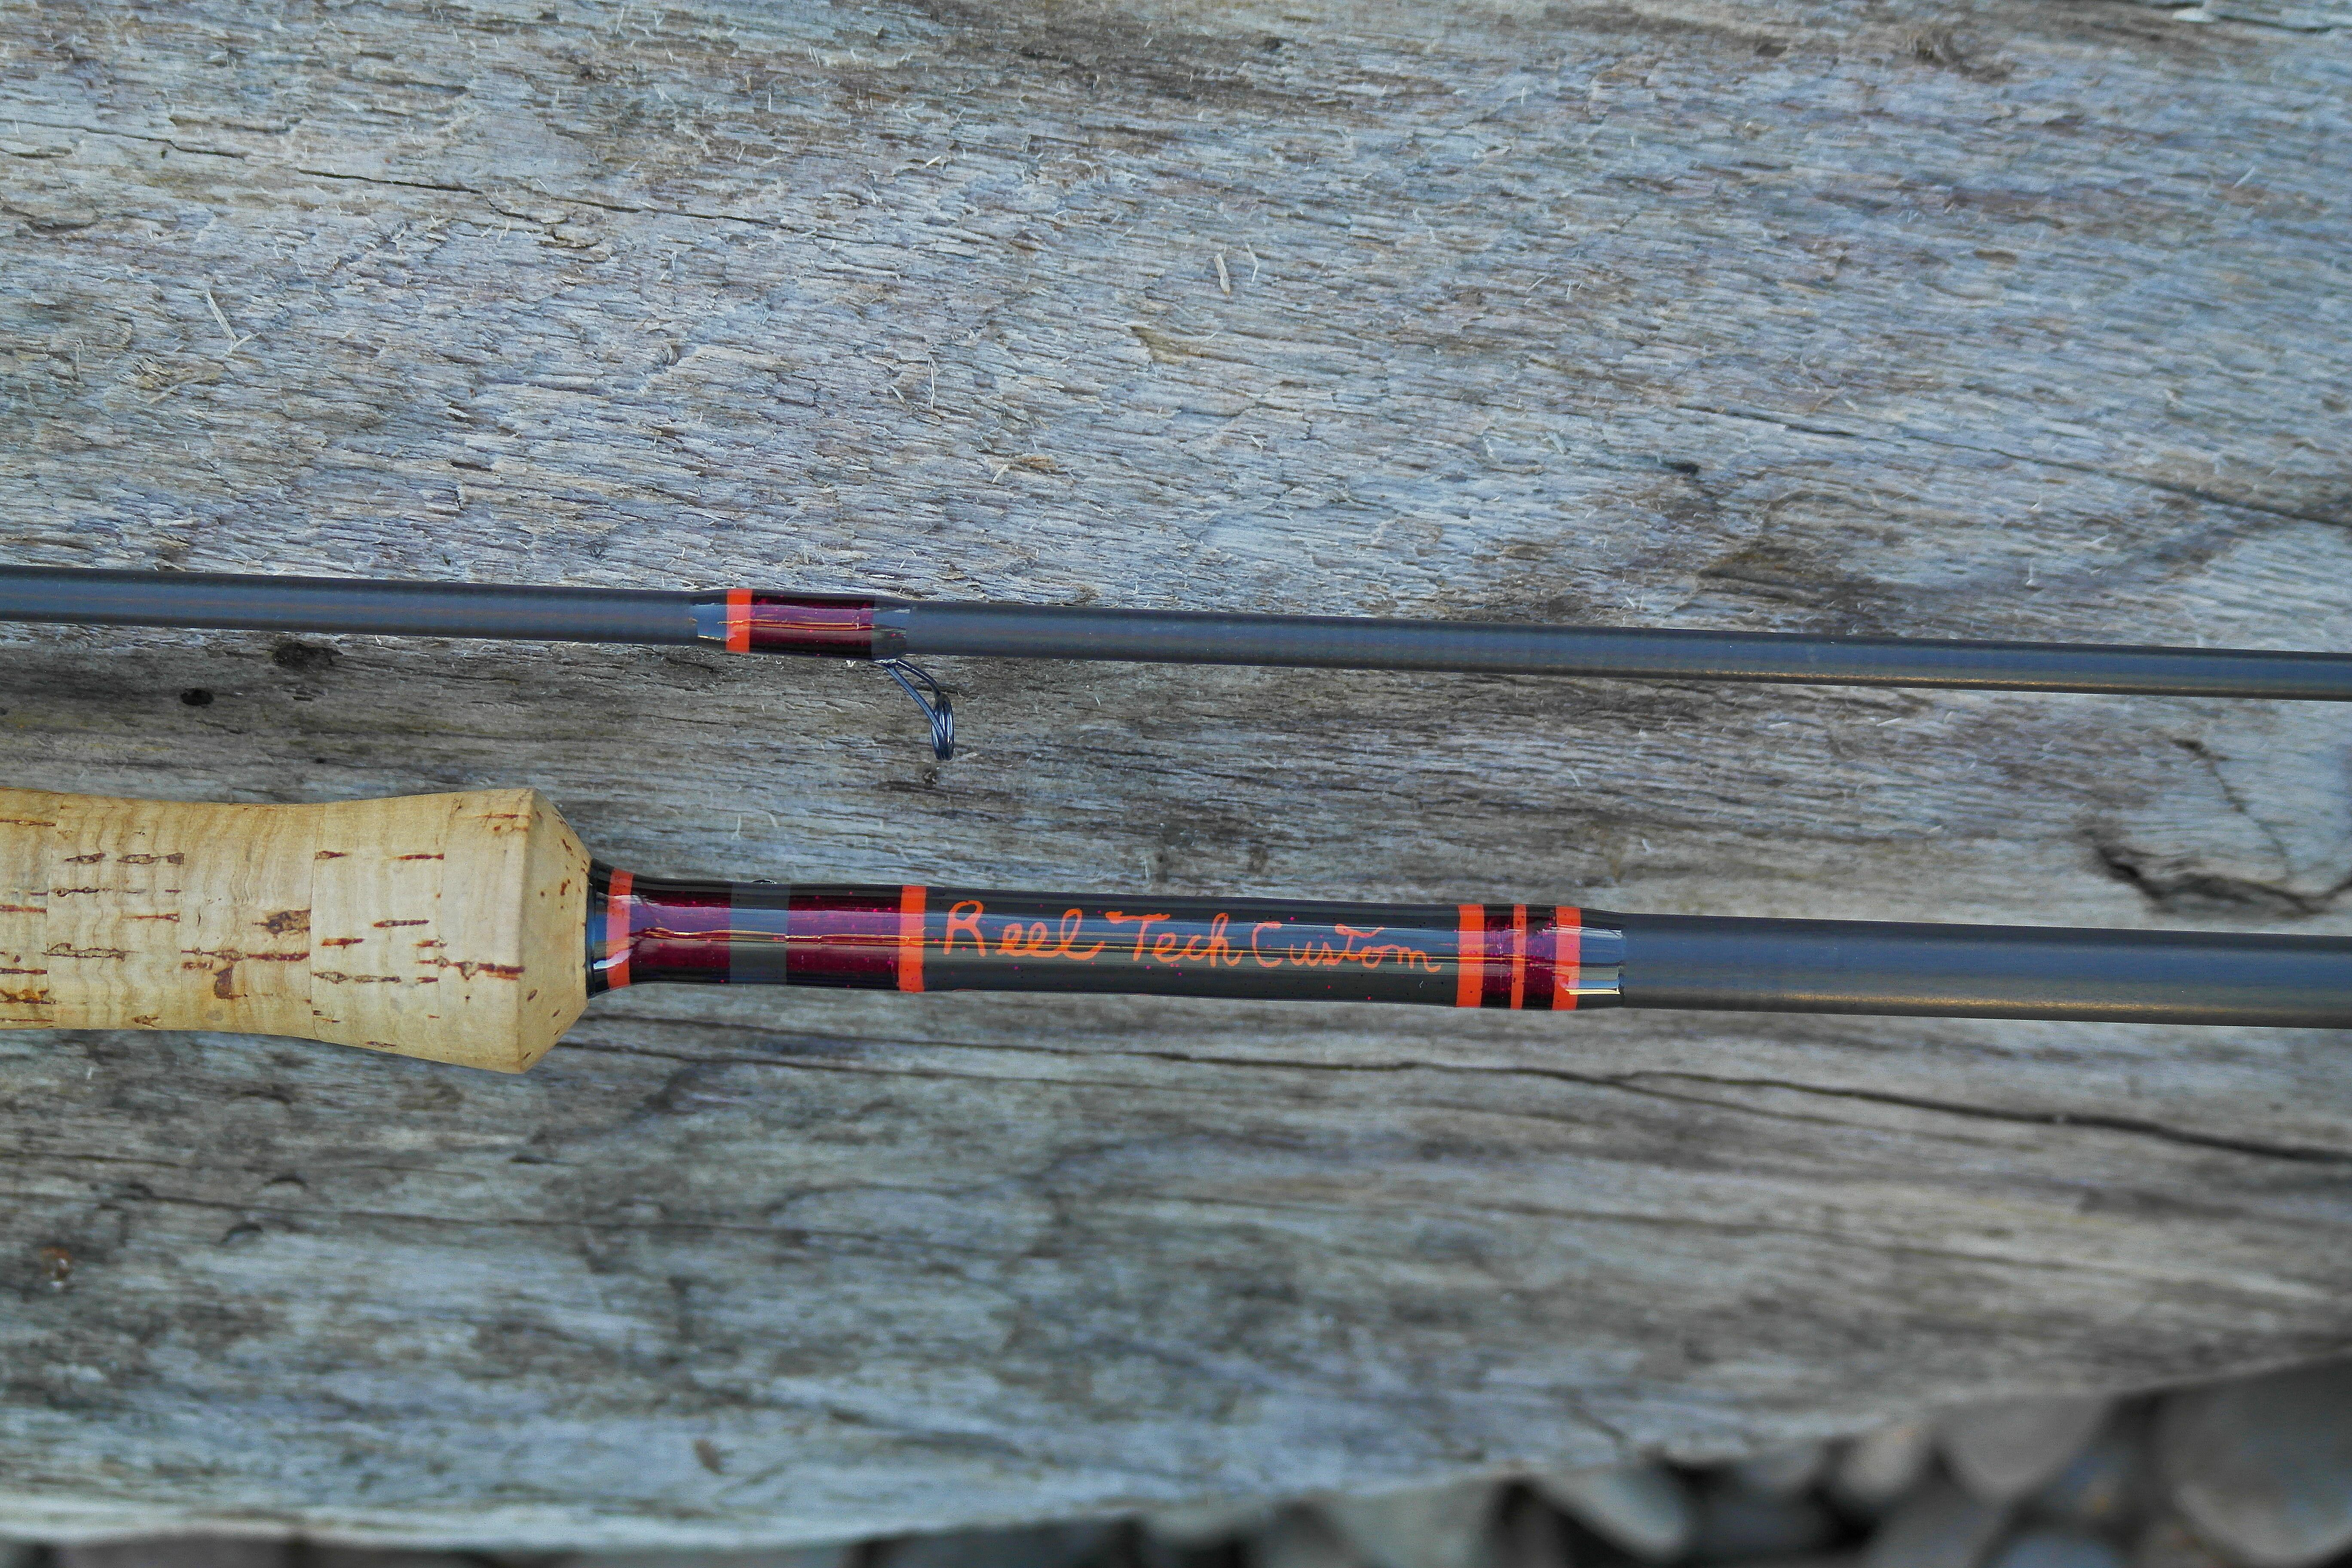 Samsung csc for Steelhead fishing rods